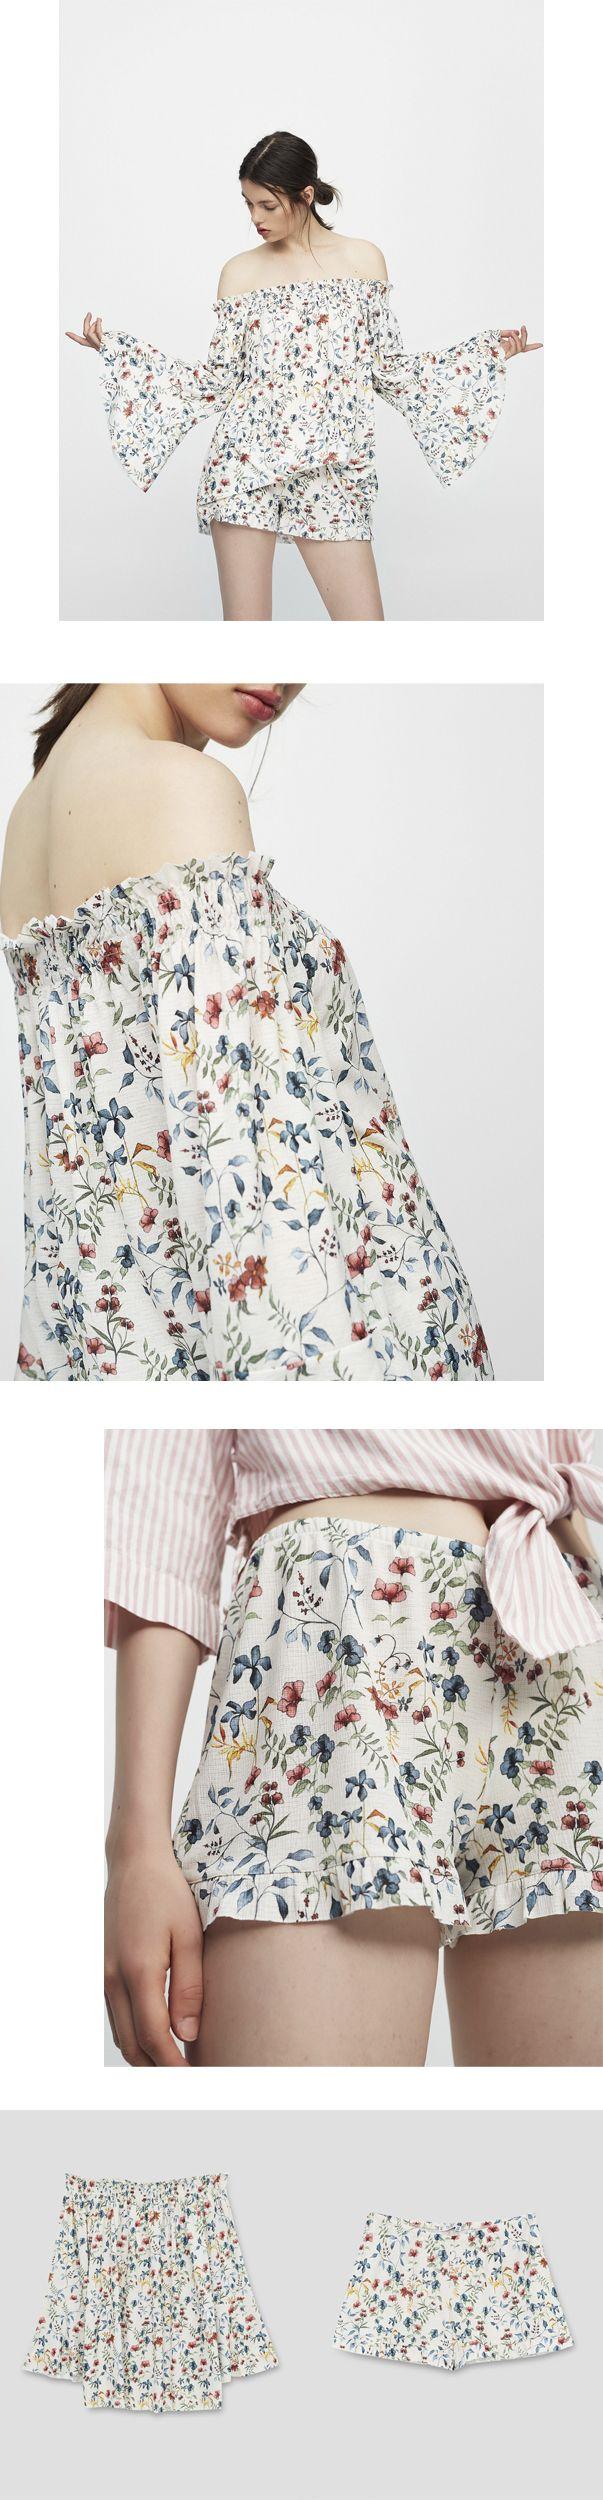 PULL&BEAR | soft floral print, Summer17 on Behance